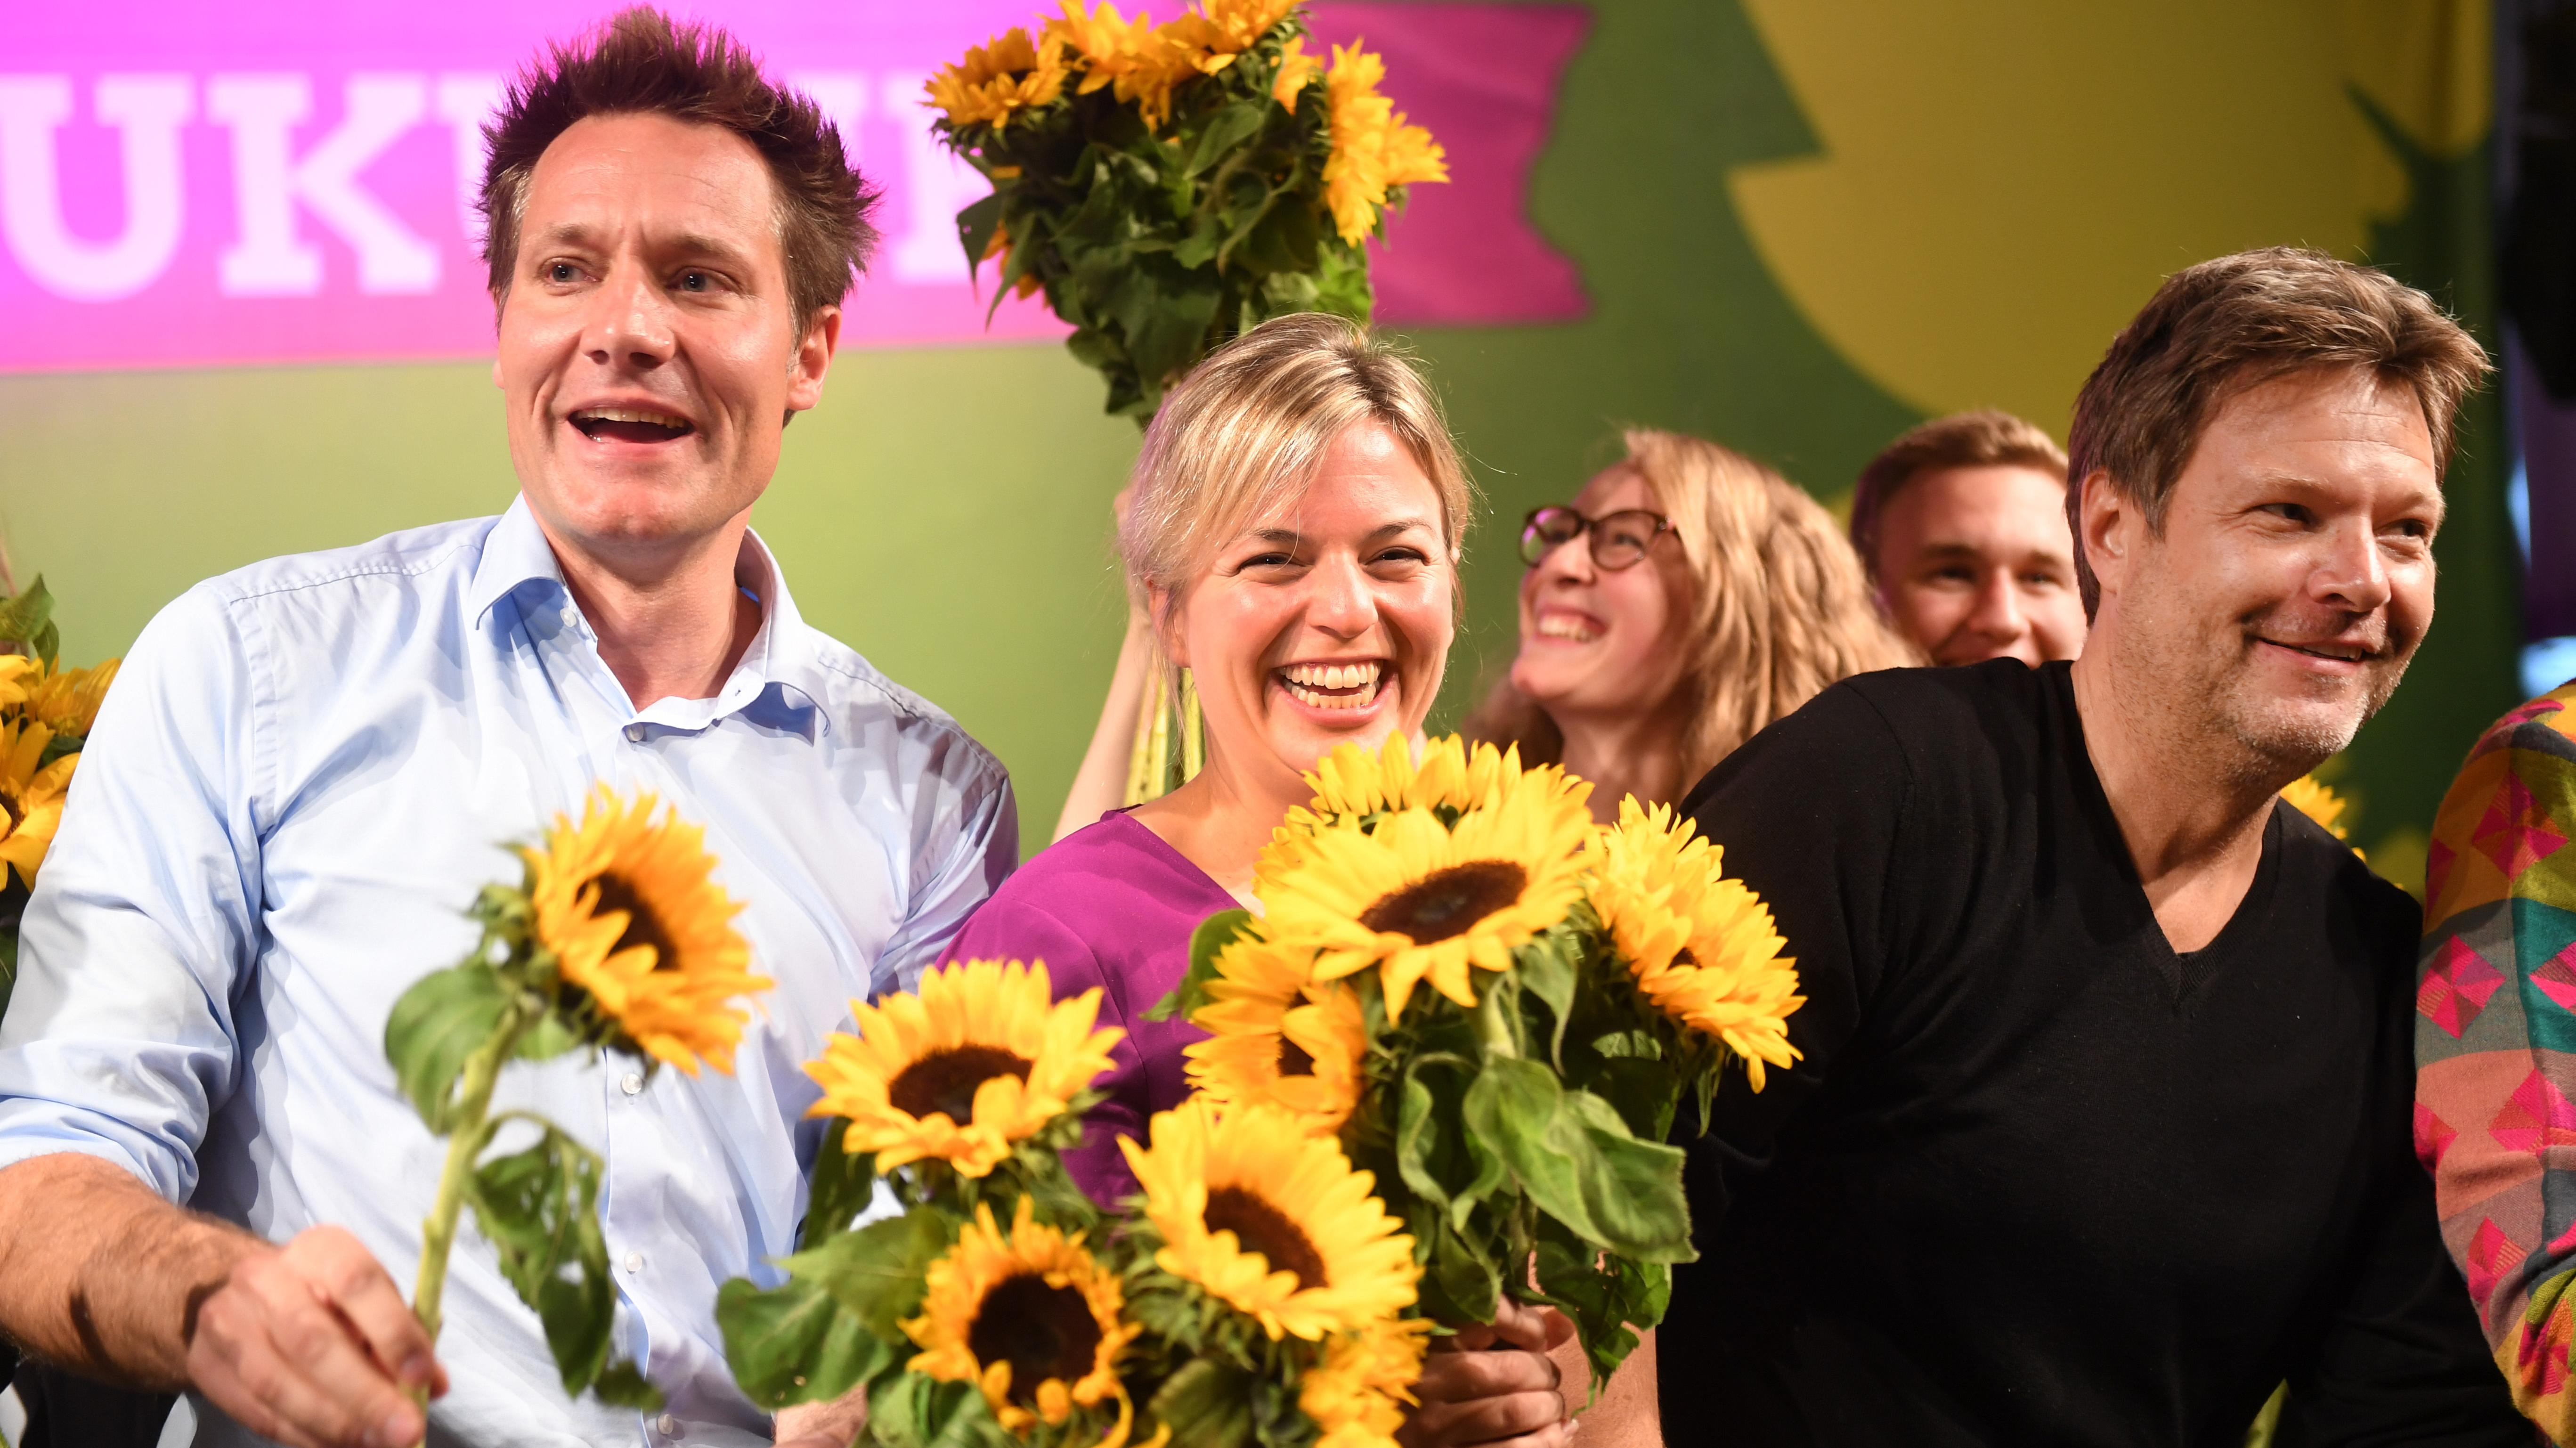 Grünen-Politiker Katharina Schulze, Ludwig Hartmann und Robert Habeck